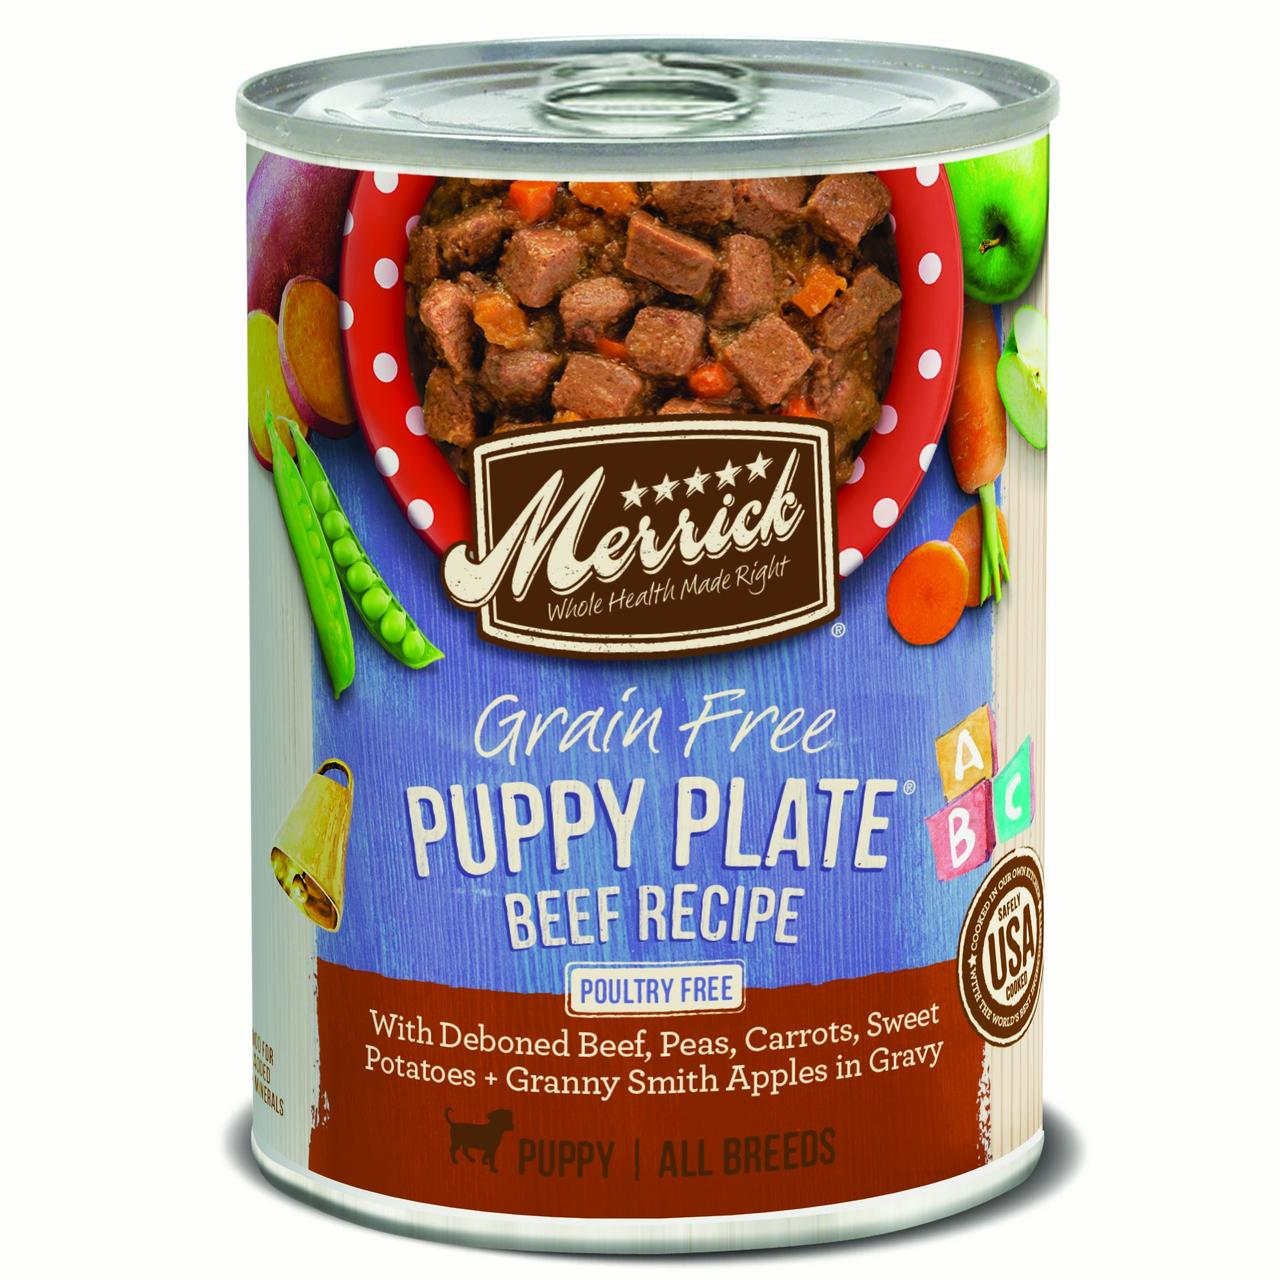 Merrick Puppy Plate Grain-Free Beef Recipe Wet Dog Food, 12.7 Oz, 12 Ct